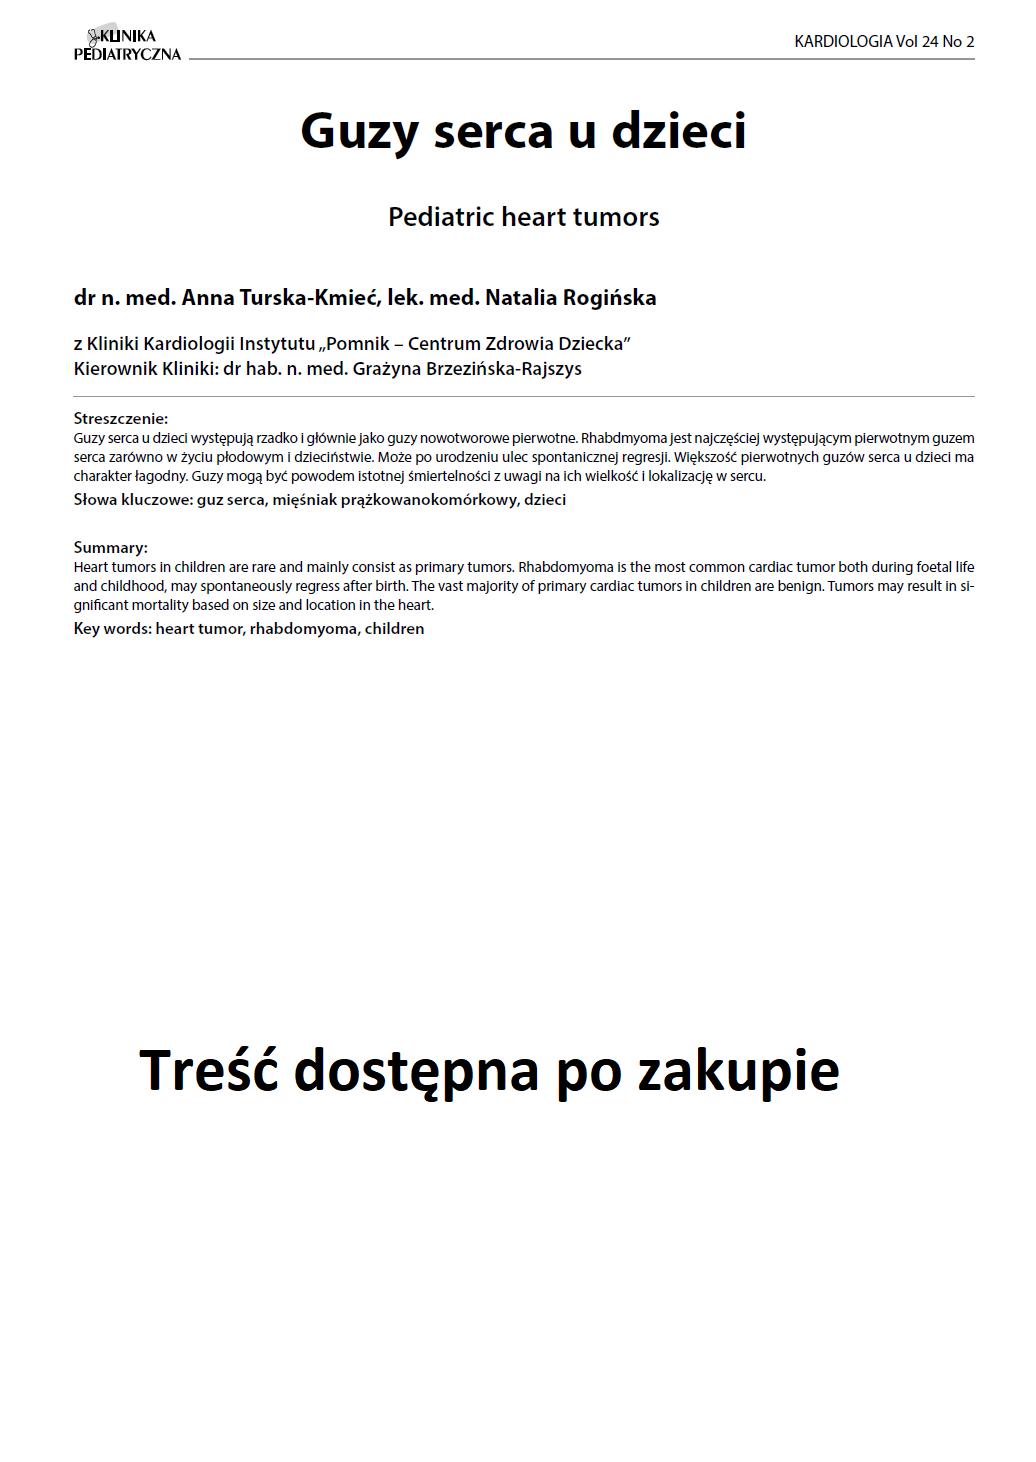 KP 2 -2016- Guzy serca u dzieci